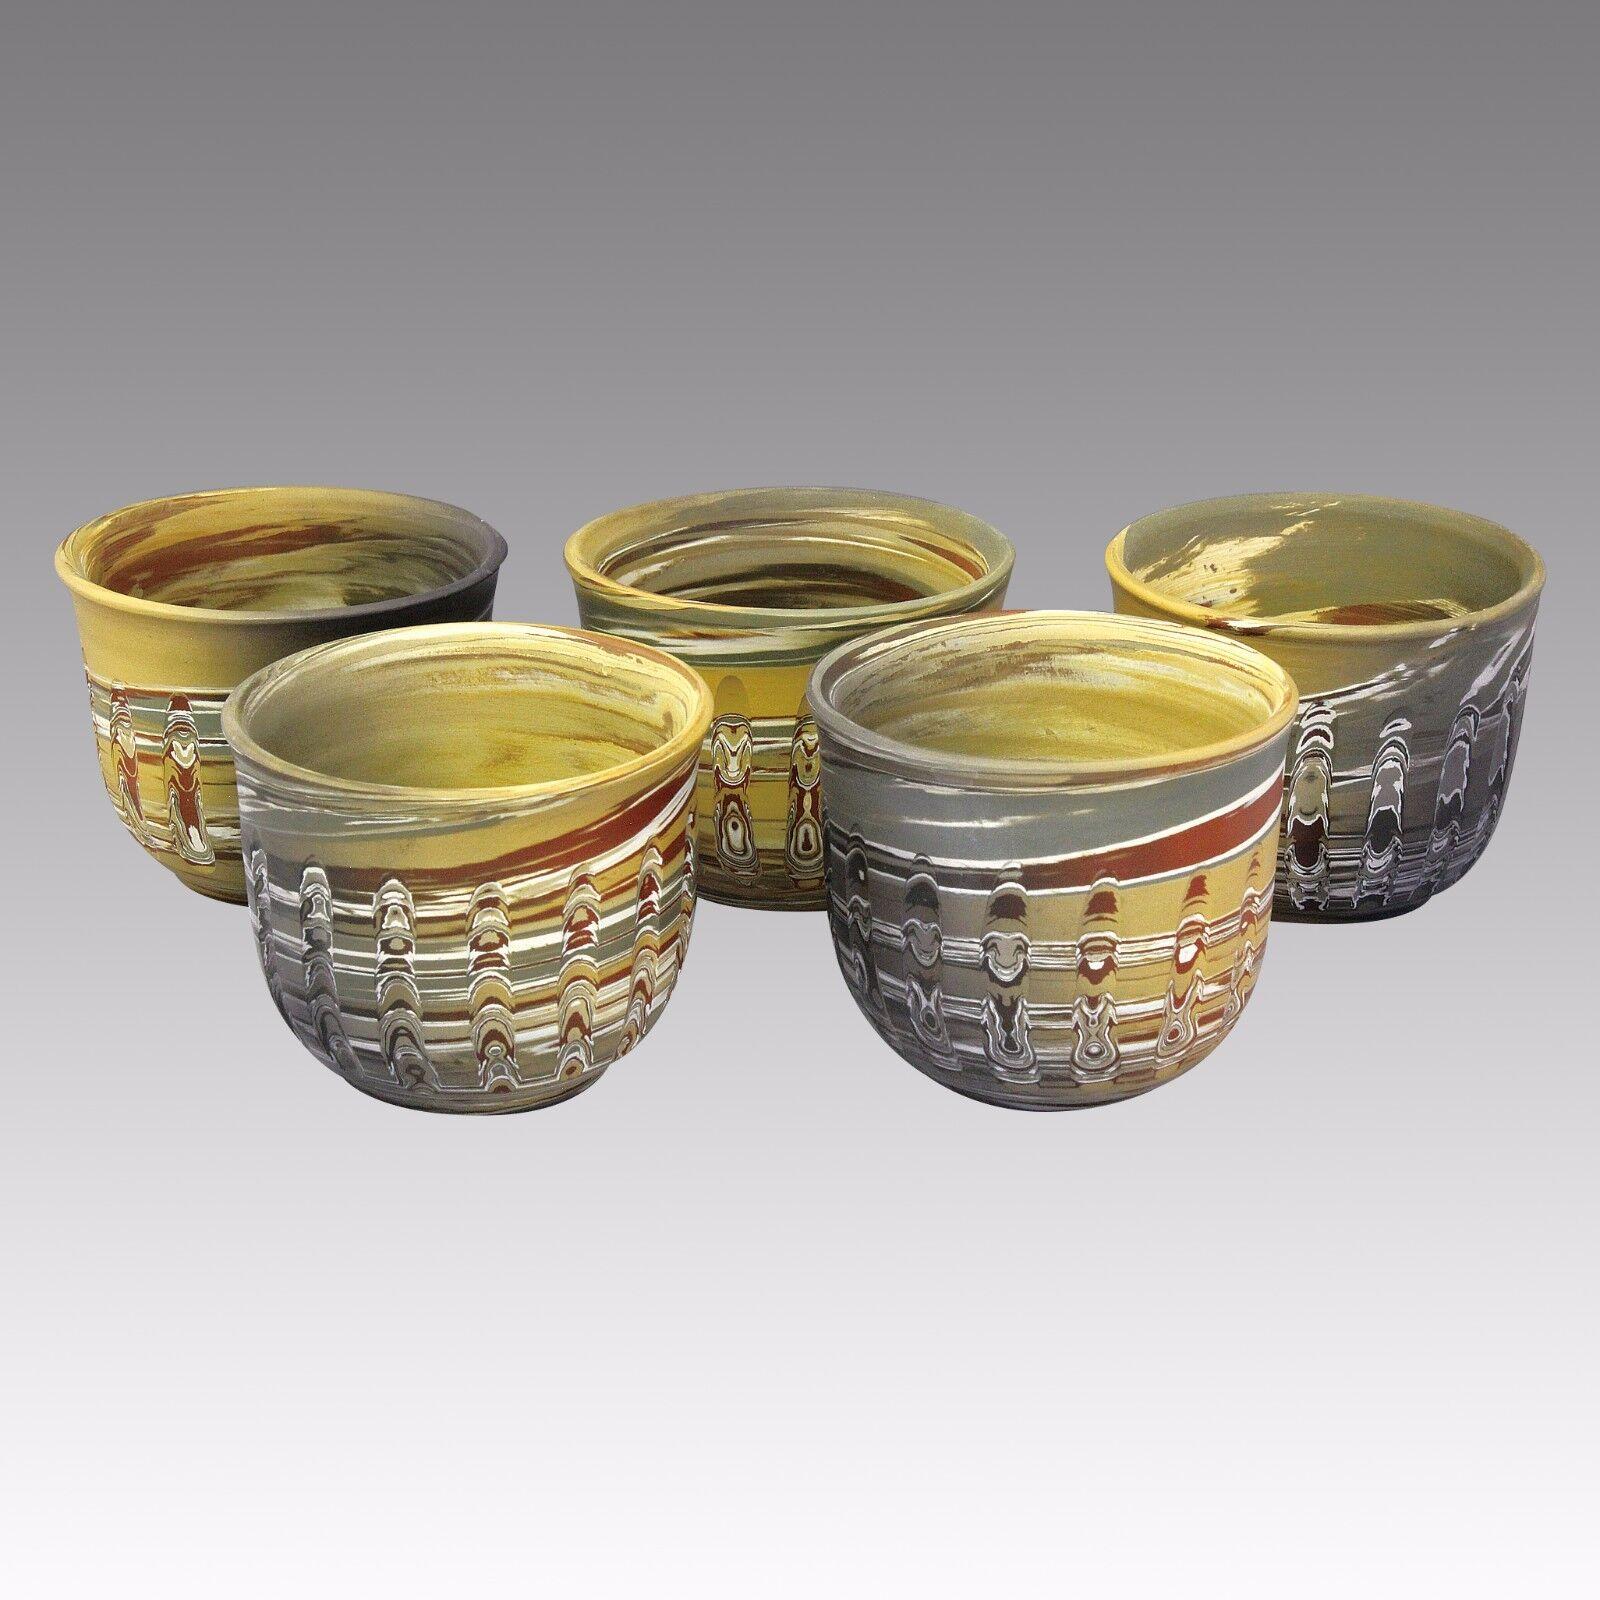 Corte verdeical-Tokoname cerámica taza de té  5 Chawan-japonés de cerámica